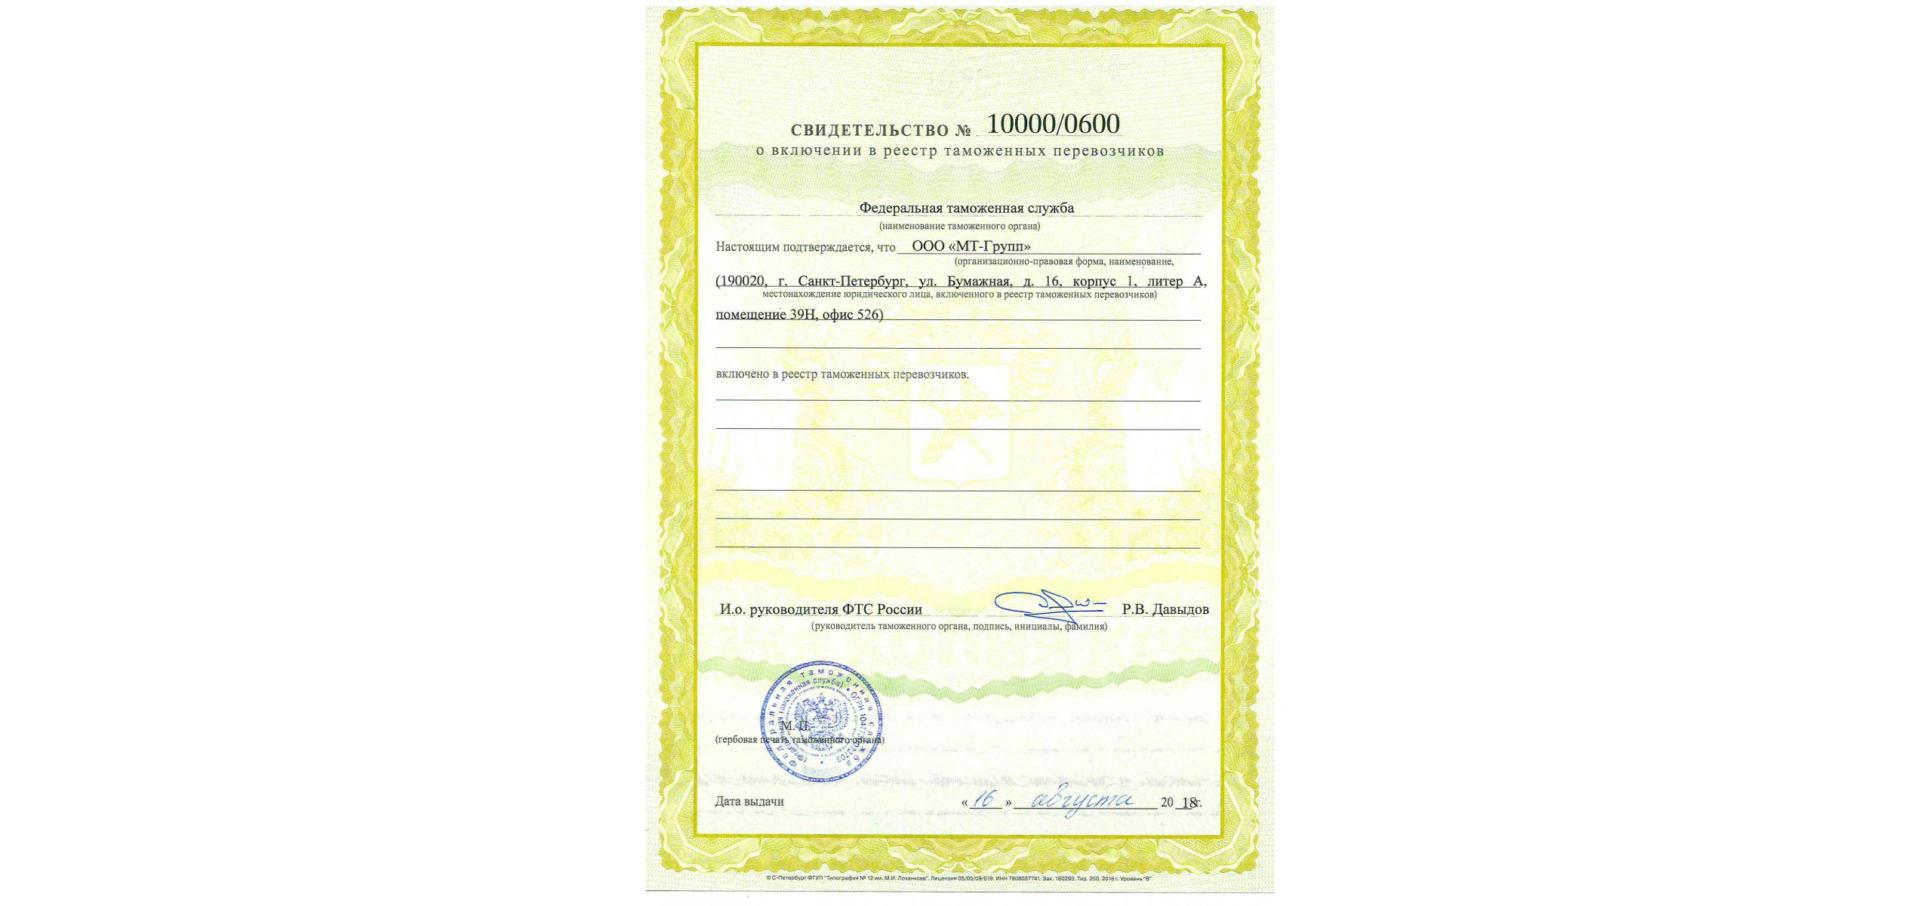 SeaEnergy включена в реестр таможенных перевозчиков ФТС РФ